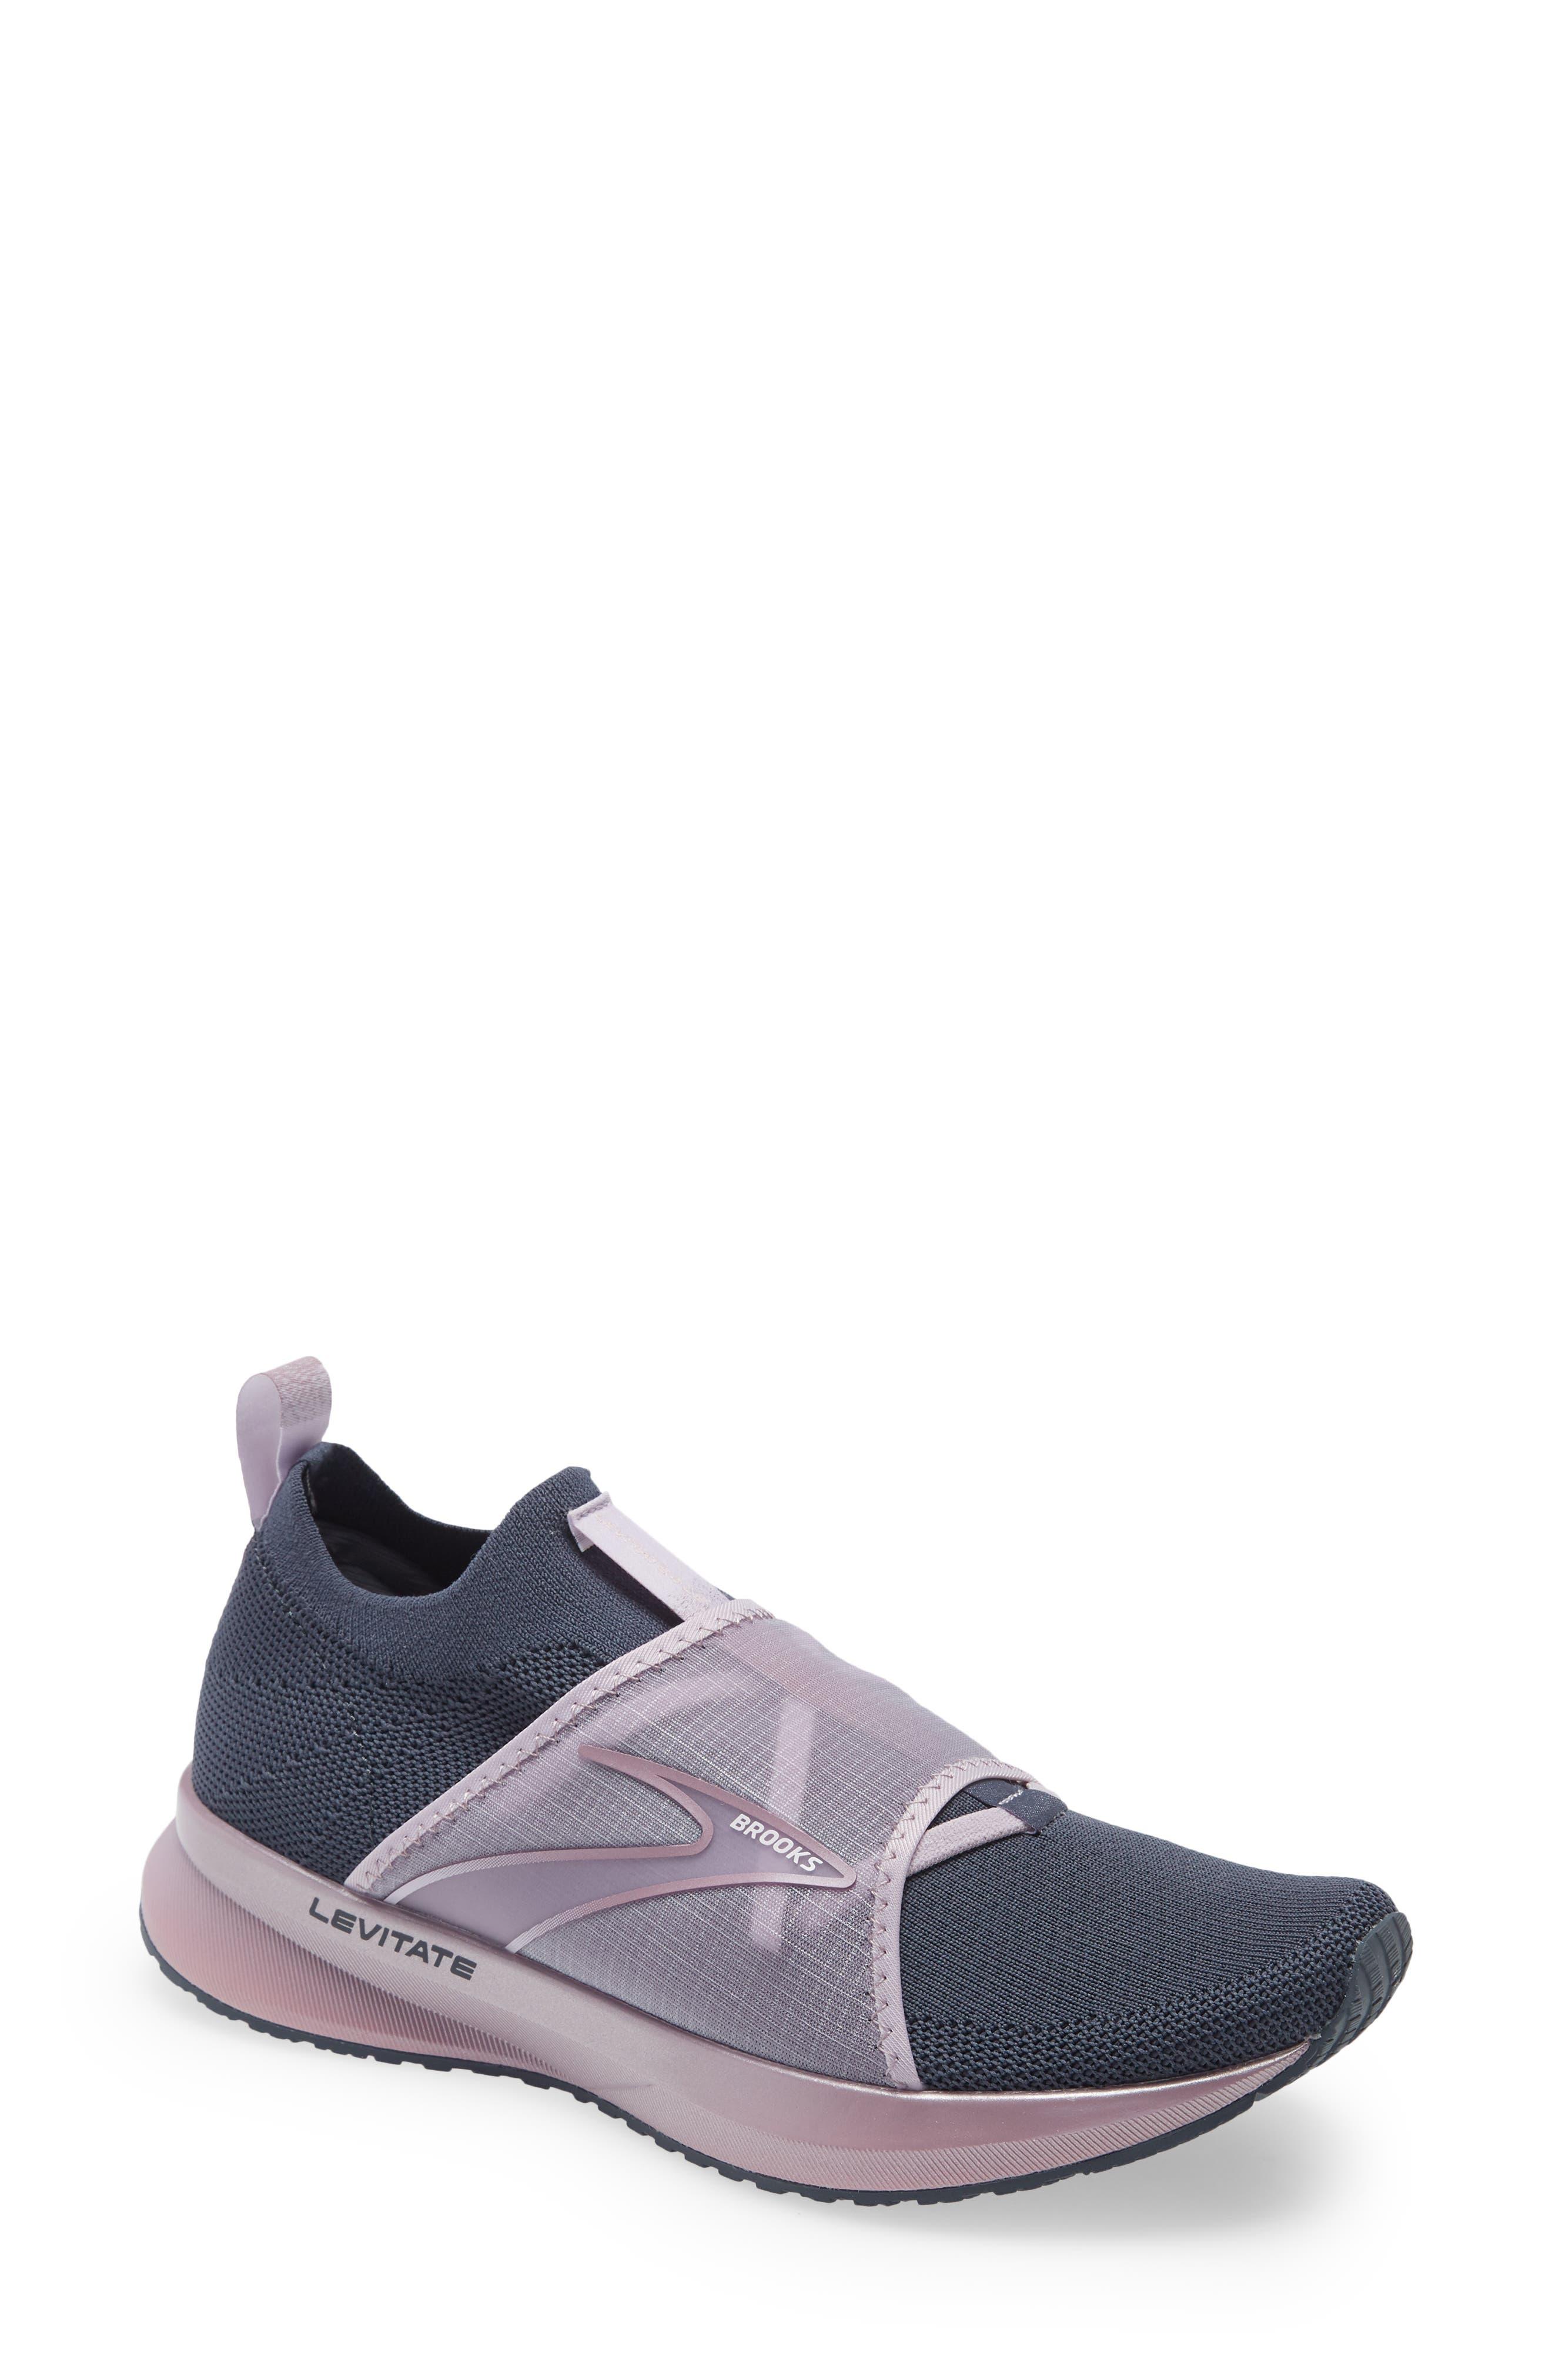 Levitate 4 Le Running Shoe